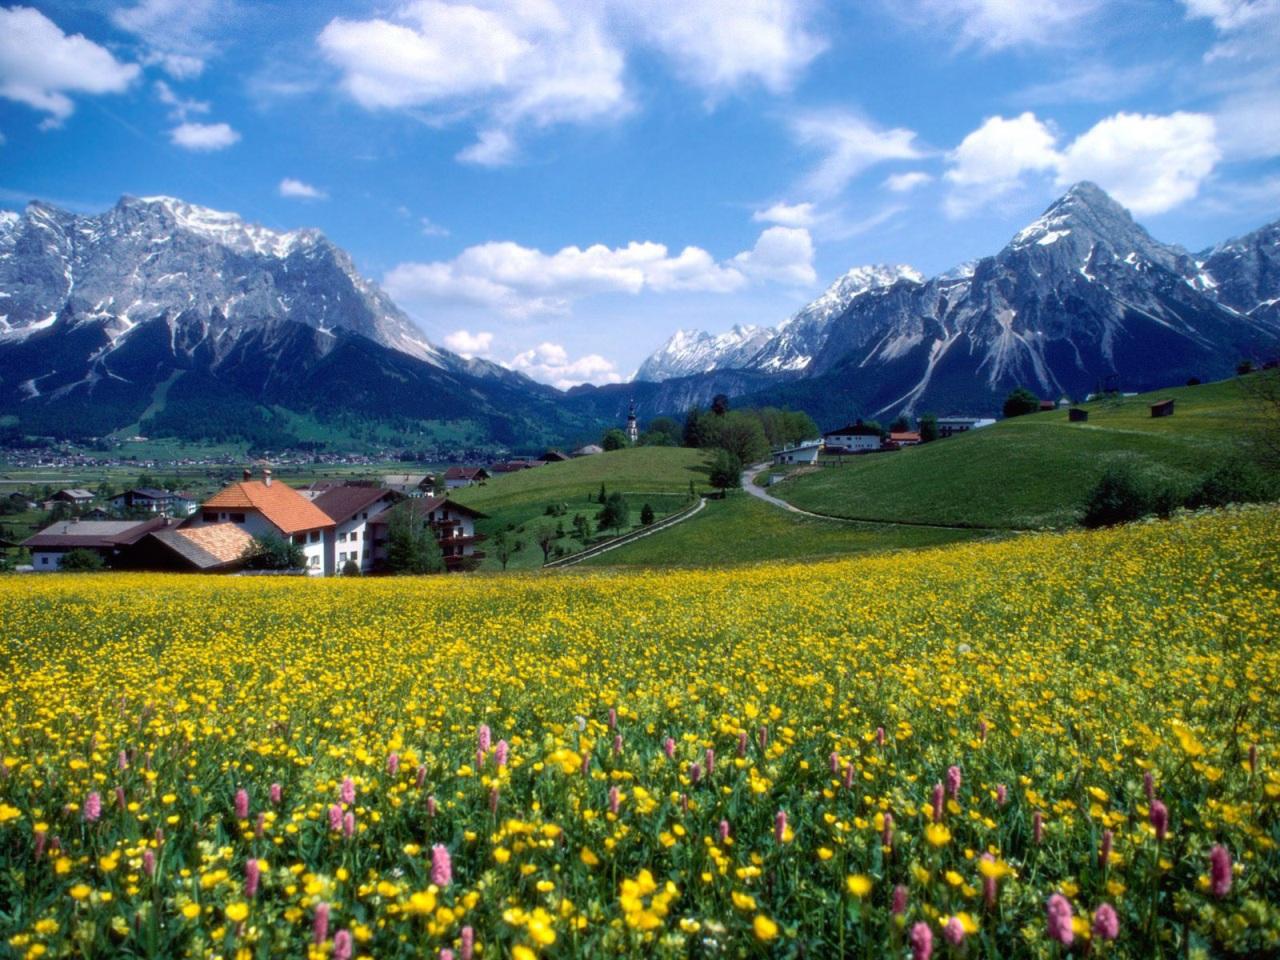 Imagenes De Paisajes De Primavera: Imágenes De Paisajes De Primavera